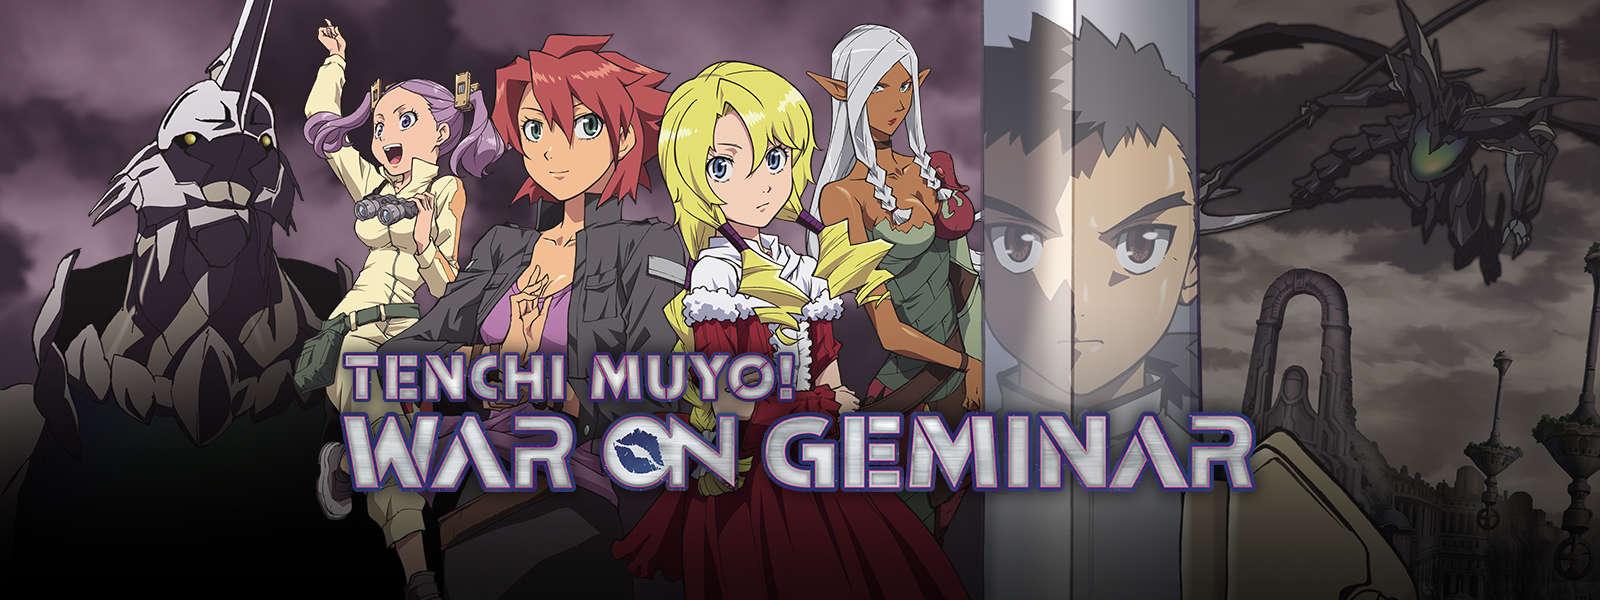 War on geminar episode 1 english dub